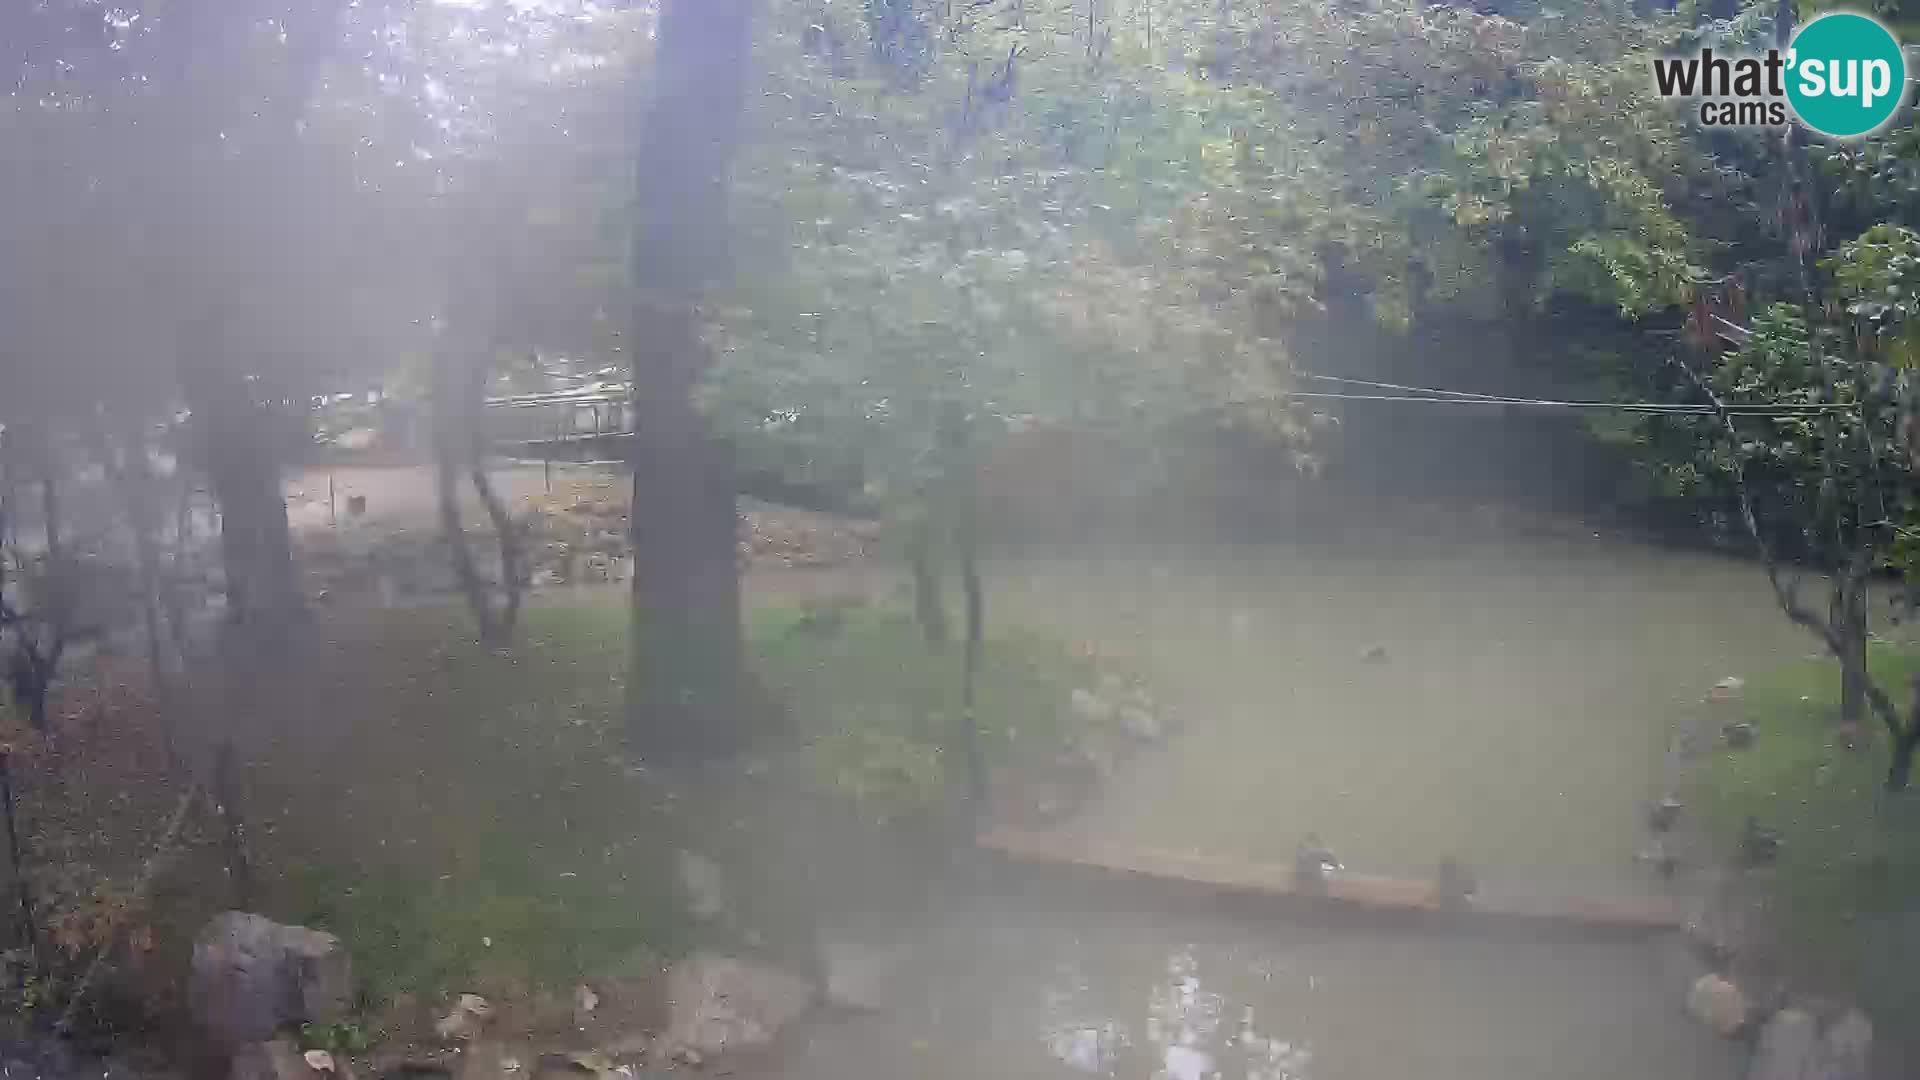 Totenkopfaffen – Saimiri ZOO Ljubljana webcam